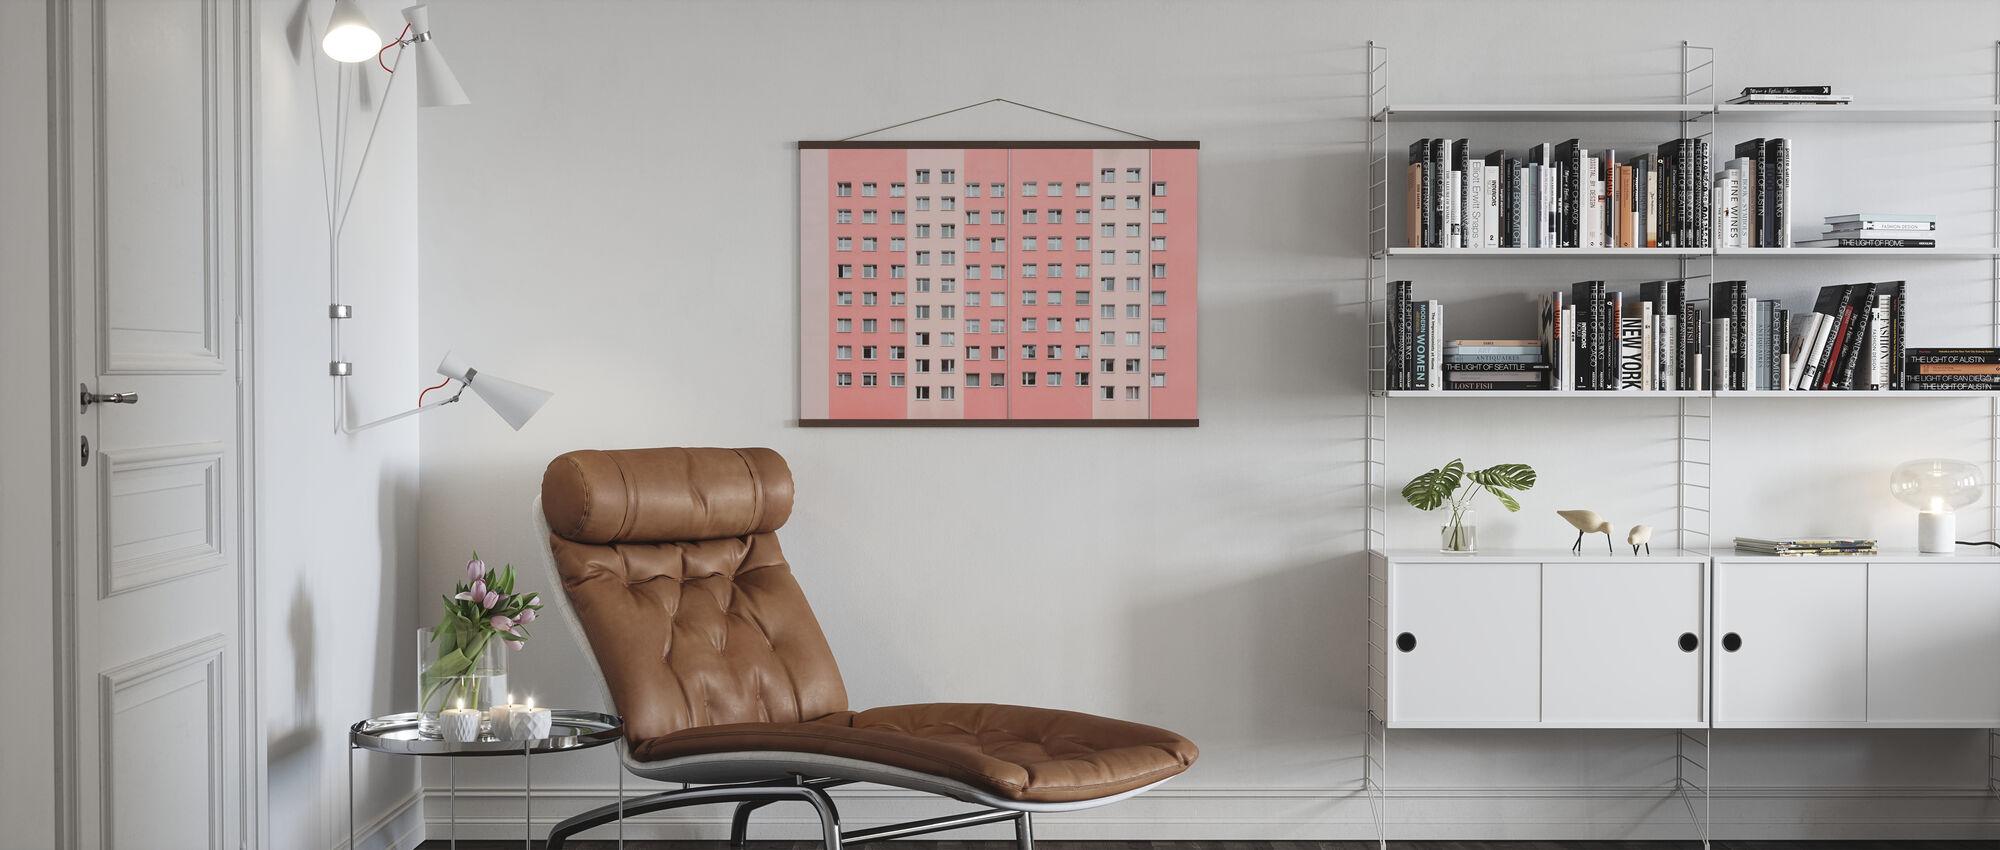 Windows - Poster - Living Room